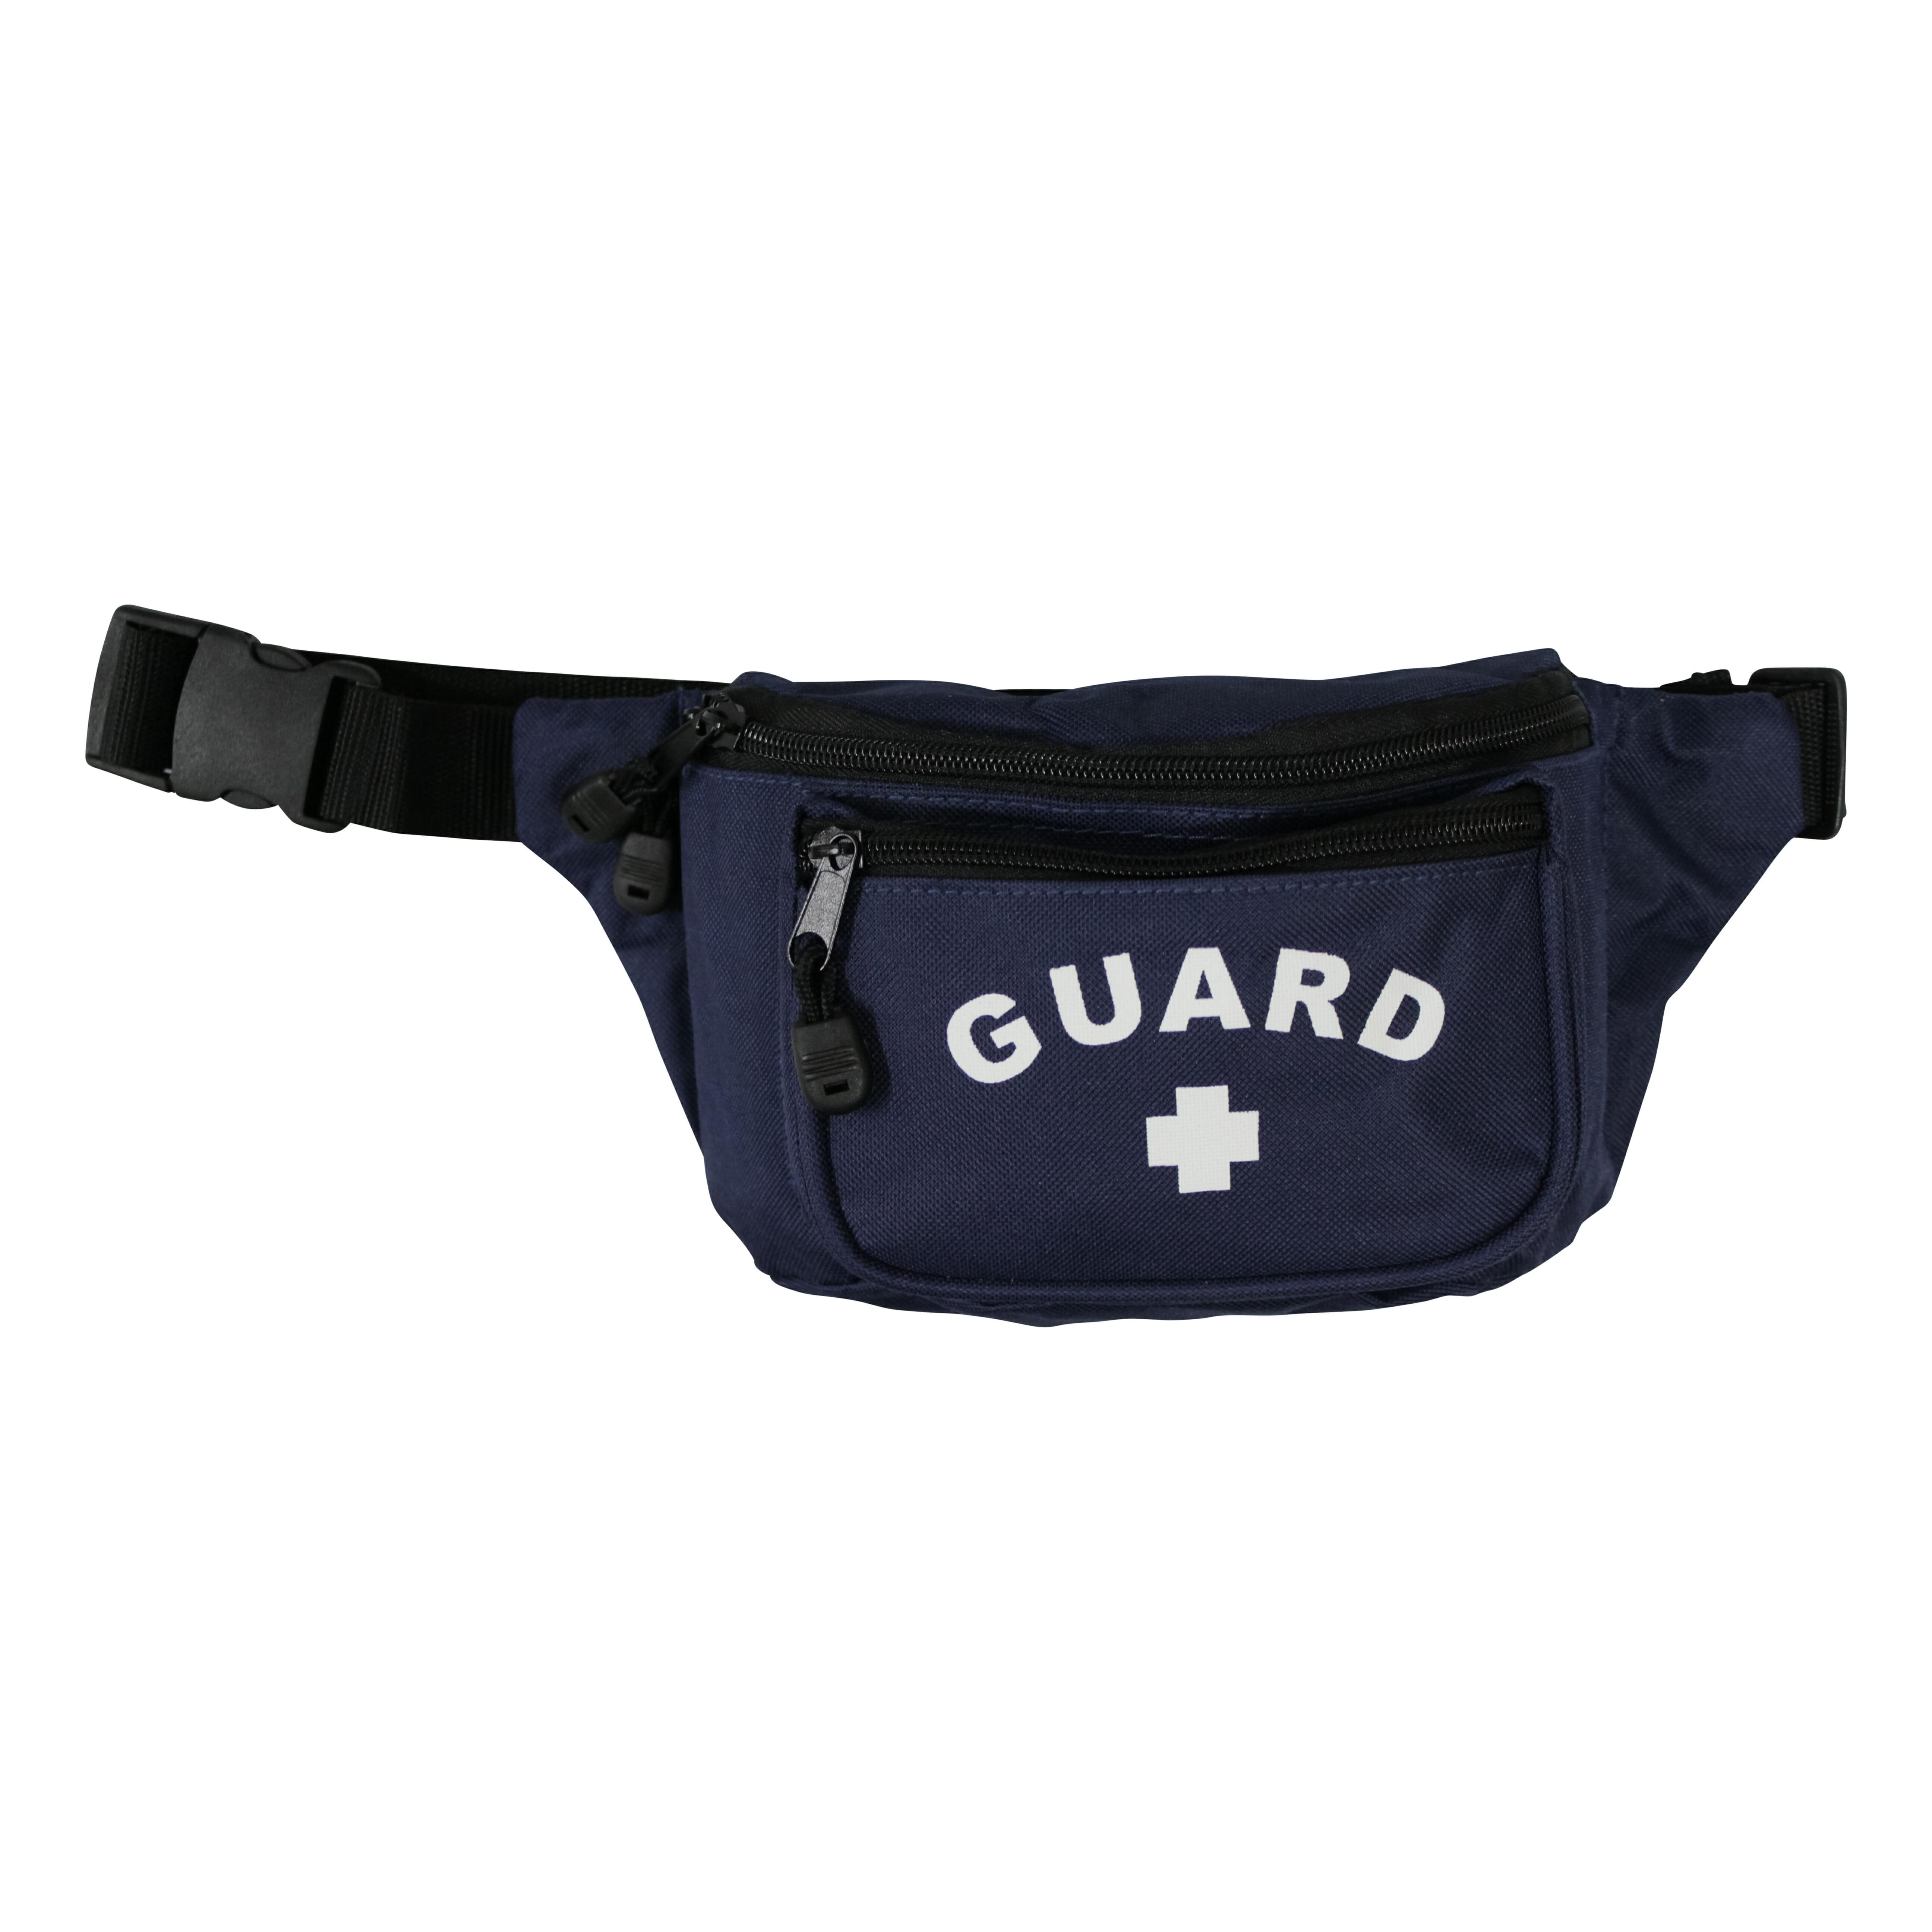 KEMP Hip Pack with Screenprint Guard